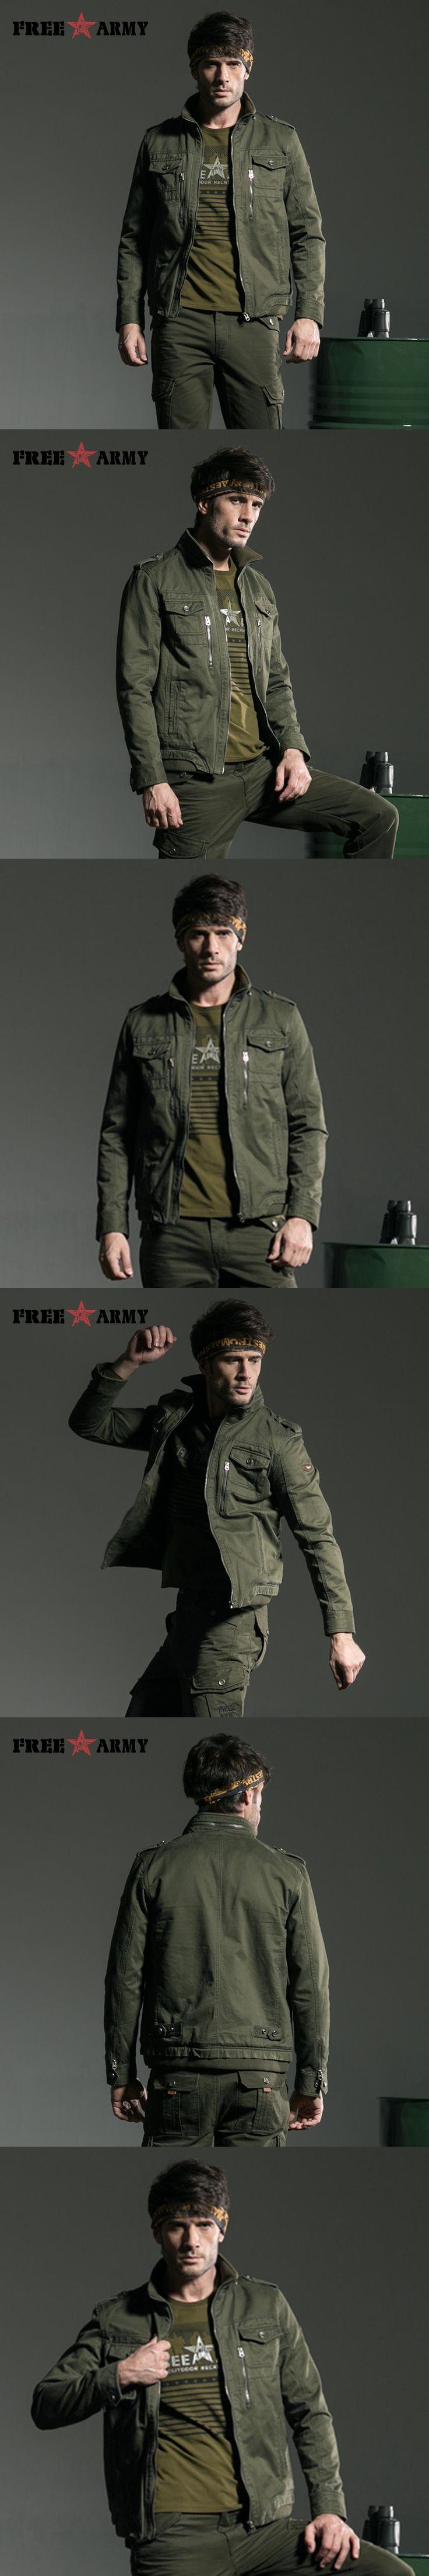 Army Coat Military Jacket Men European Style Metal Zipper Mens Coat Military Jackets cotton Warm Autumn Plus size MS-6190A